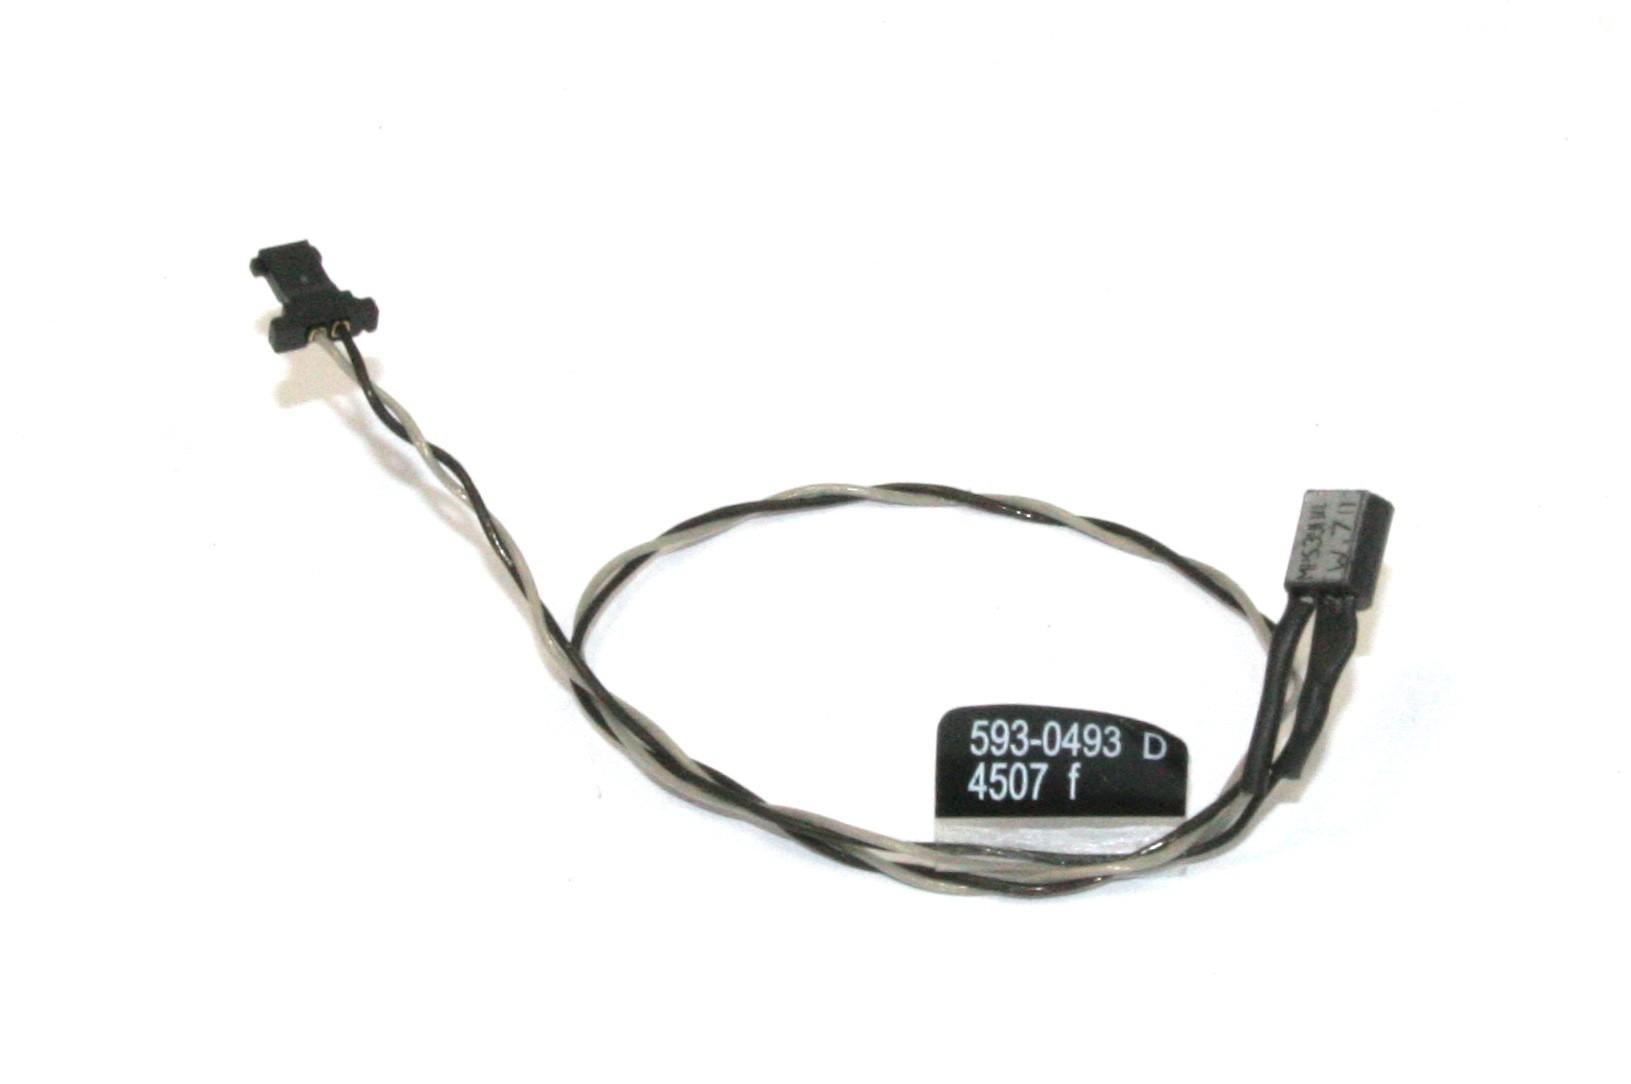 922-9215 Thermal Sensor for iMac 2009-2011 Hard Drive Upgrade